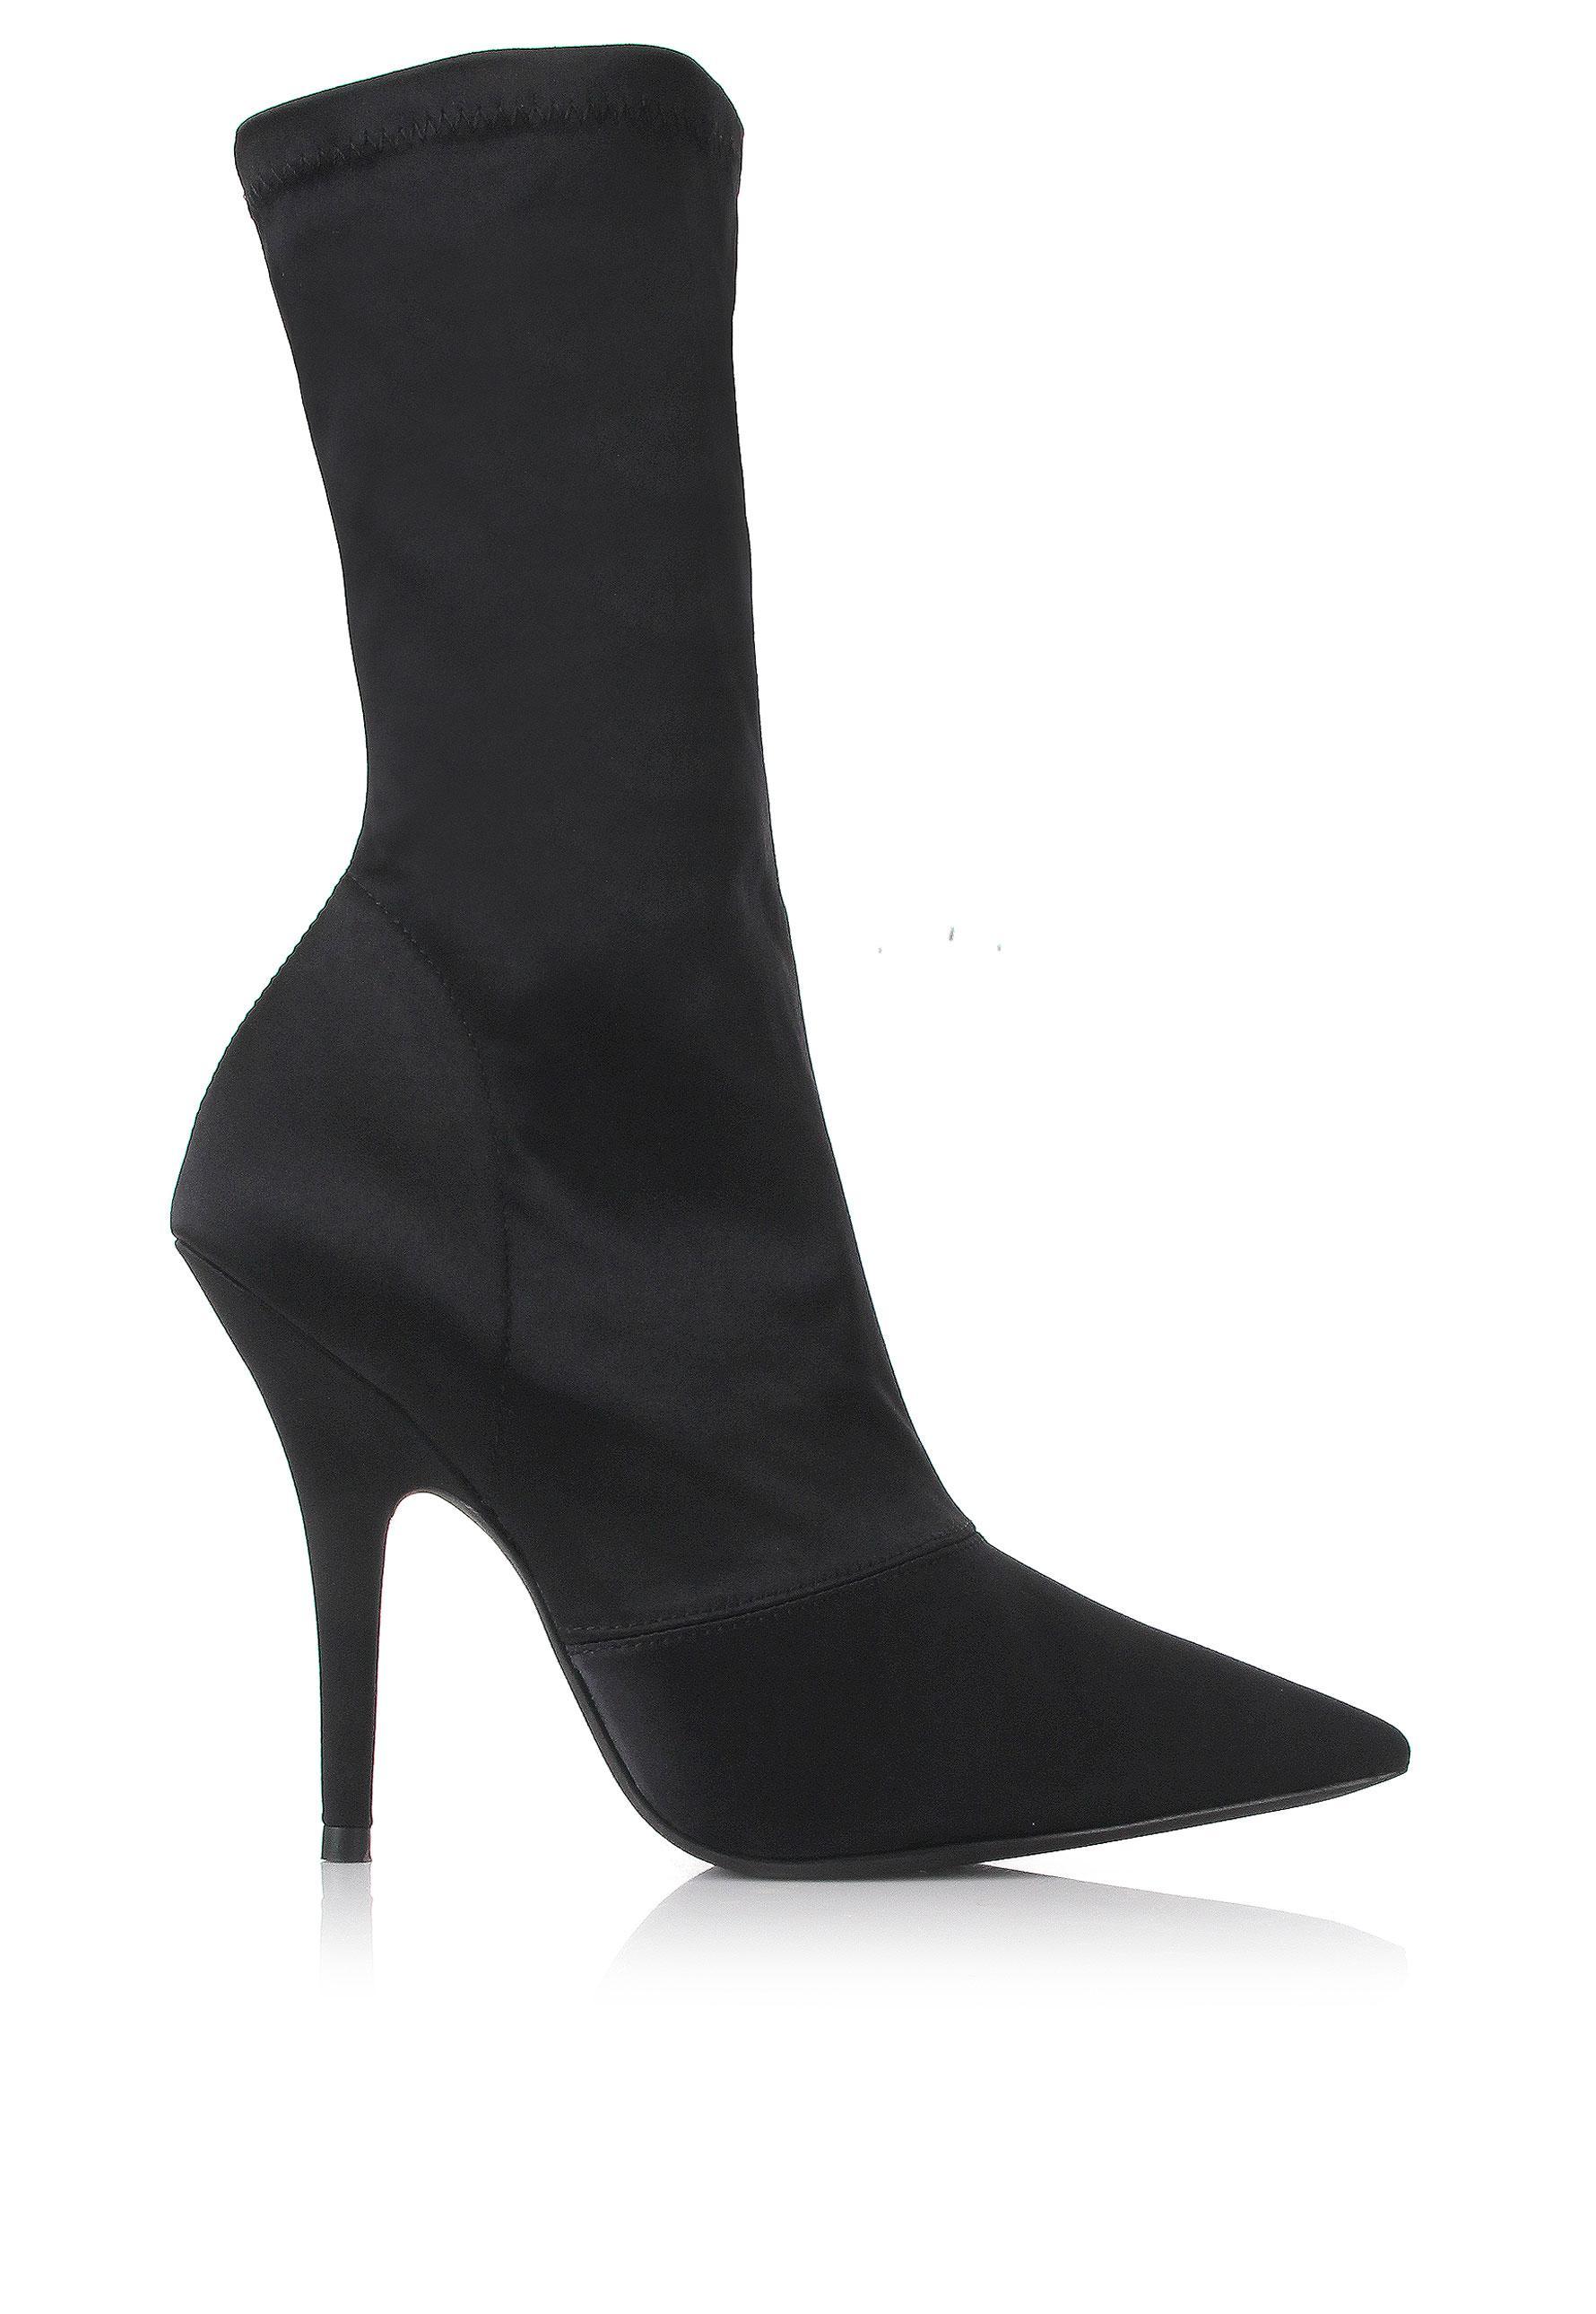 Yeezy Grey Stretch Satin Ankle Boots Sortie Ebay QUPKkl6loi